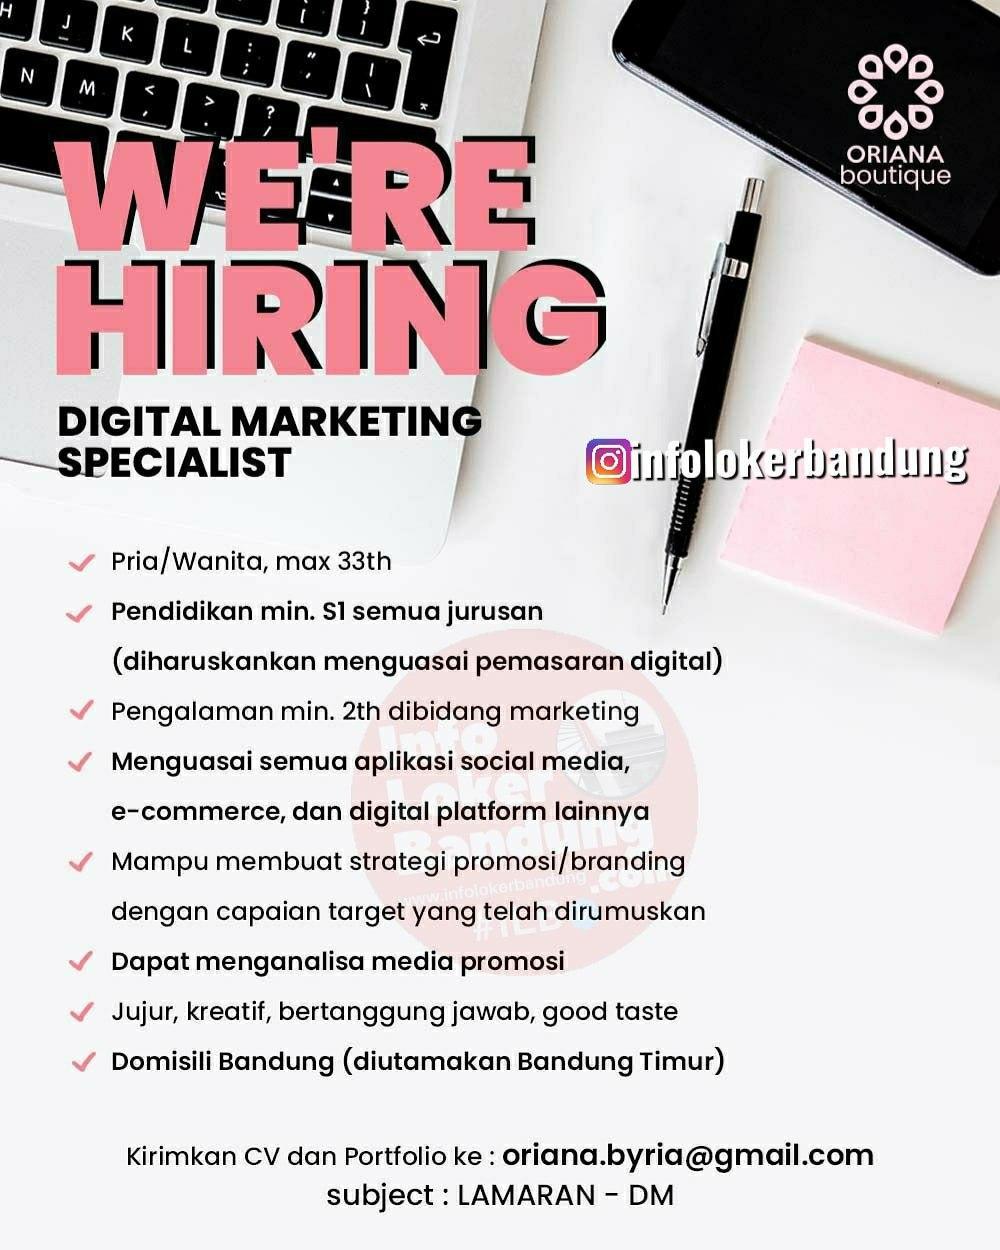 Lowongan Kerja Digital Marketing Sepcialist Oriana Boutique Bandung Agustus 2020